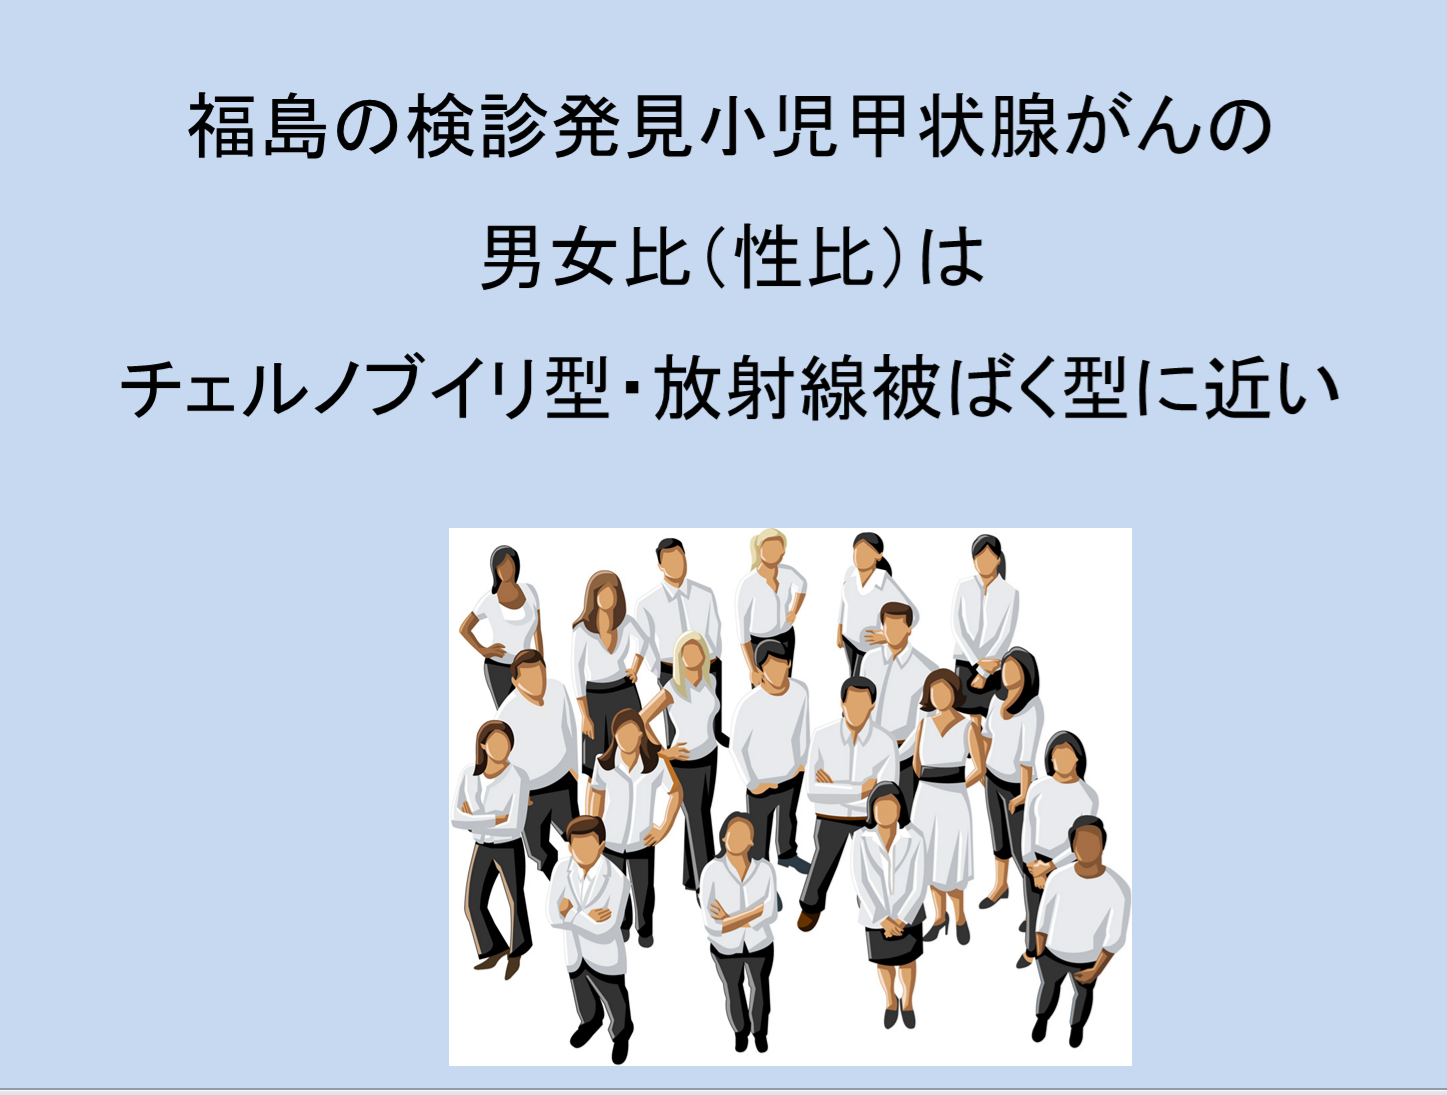 DrMatsuzaki017.png